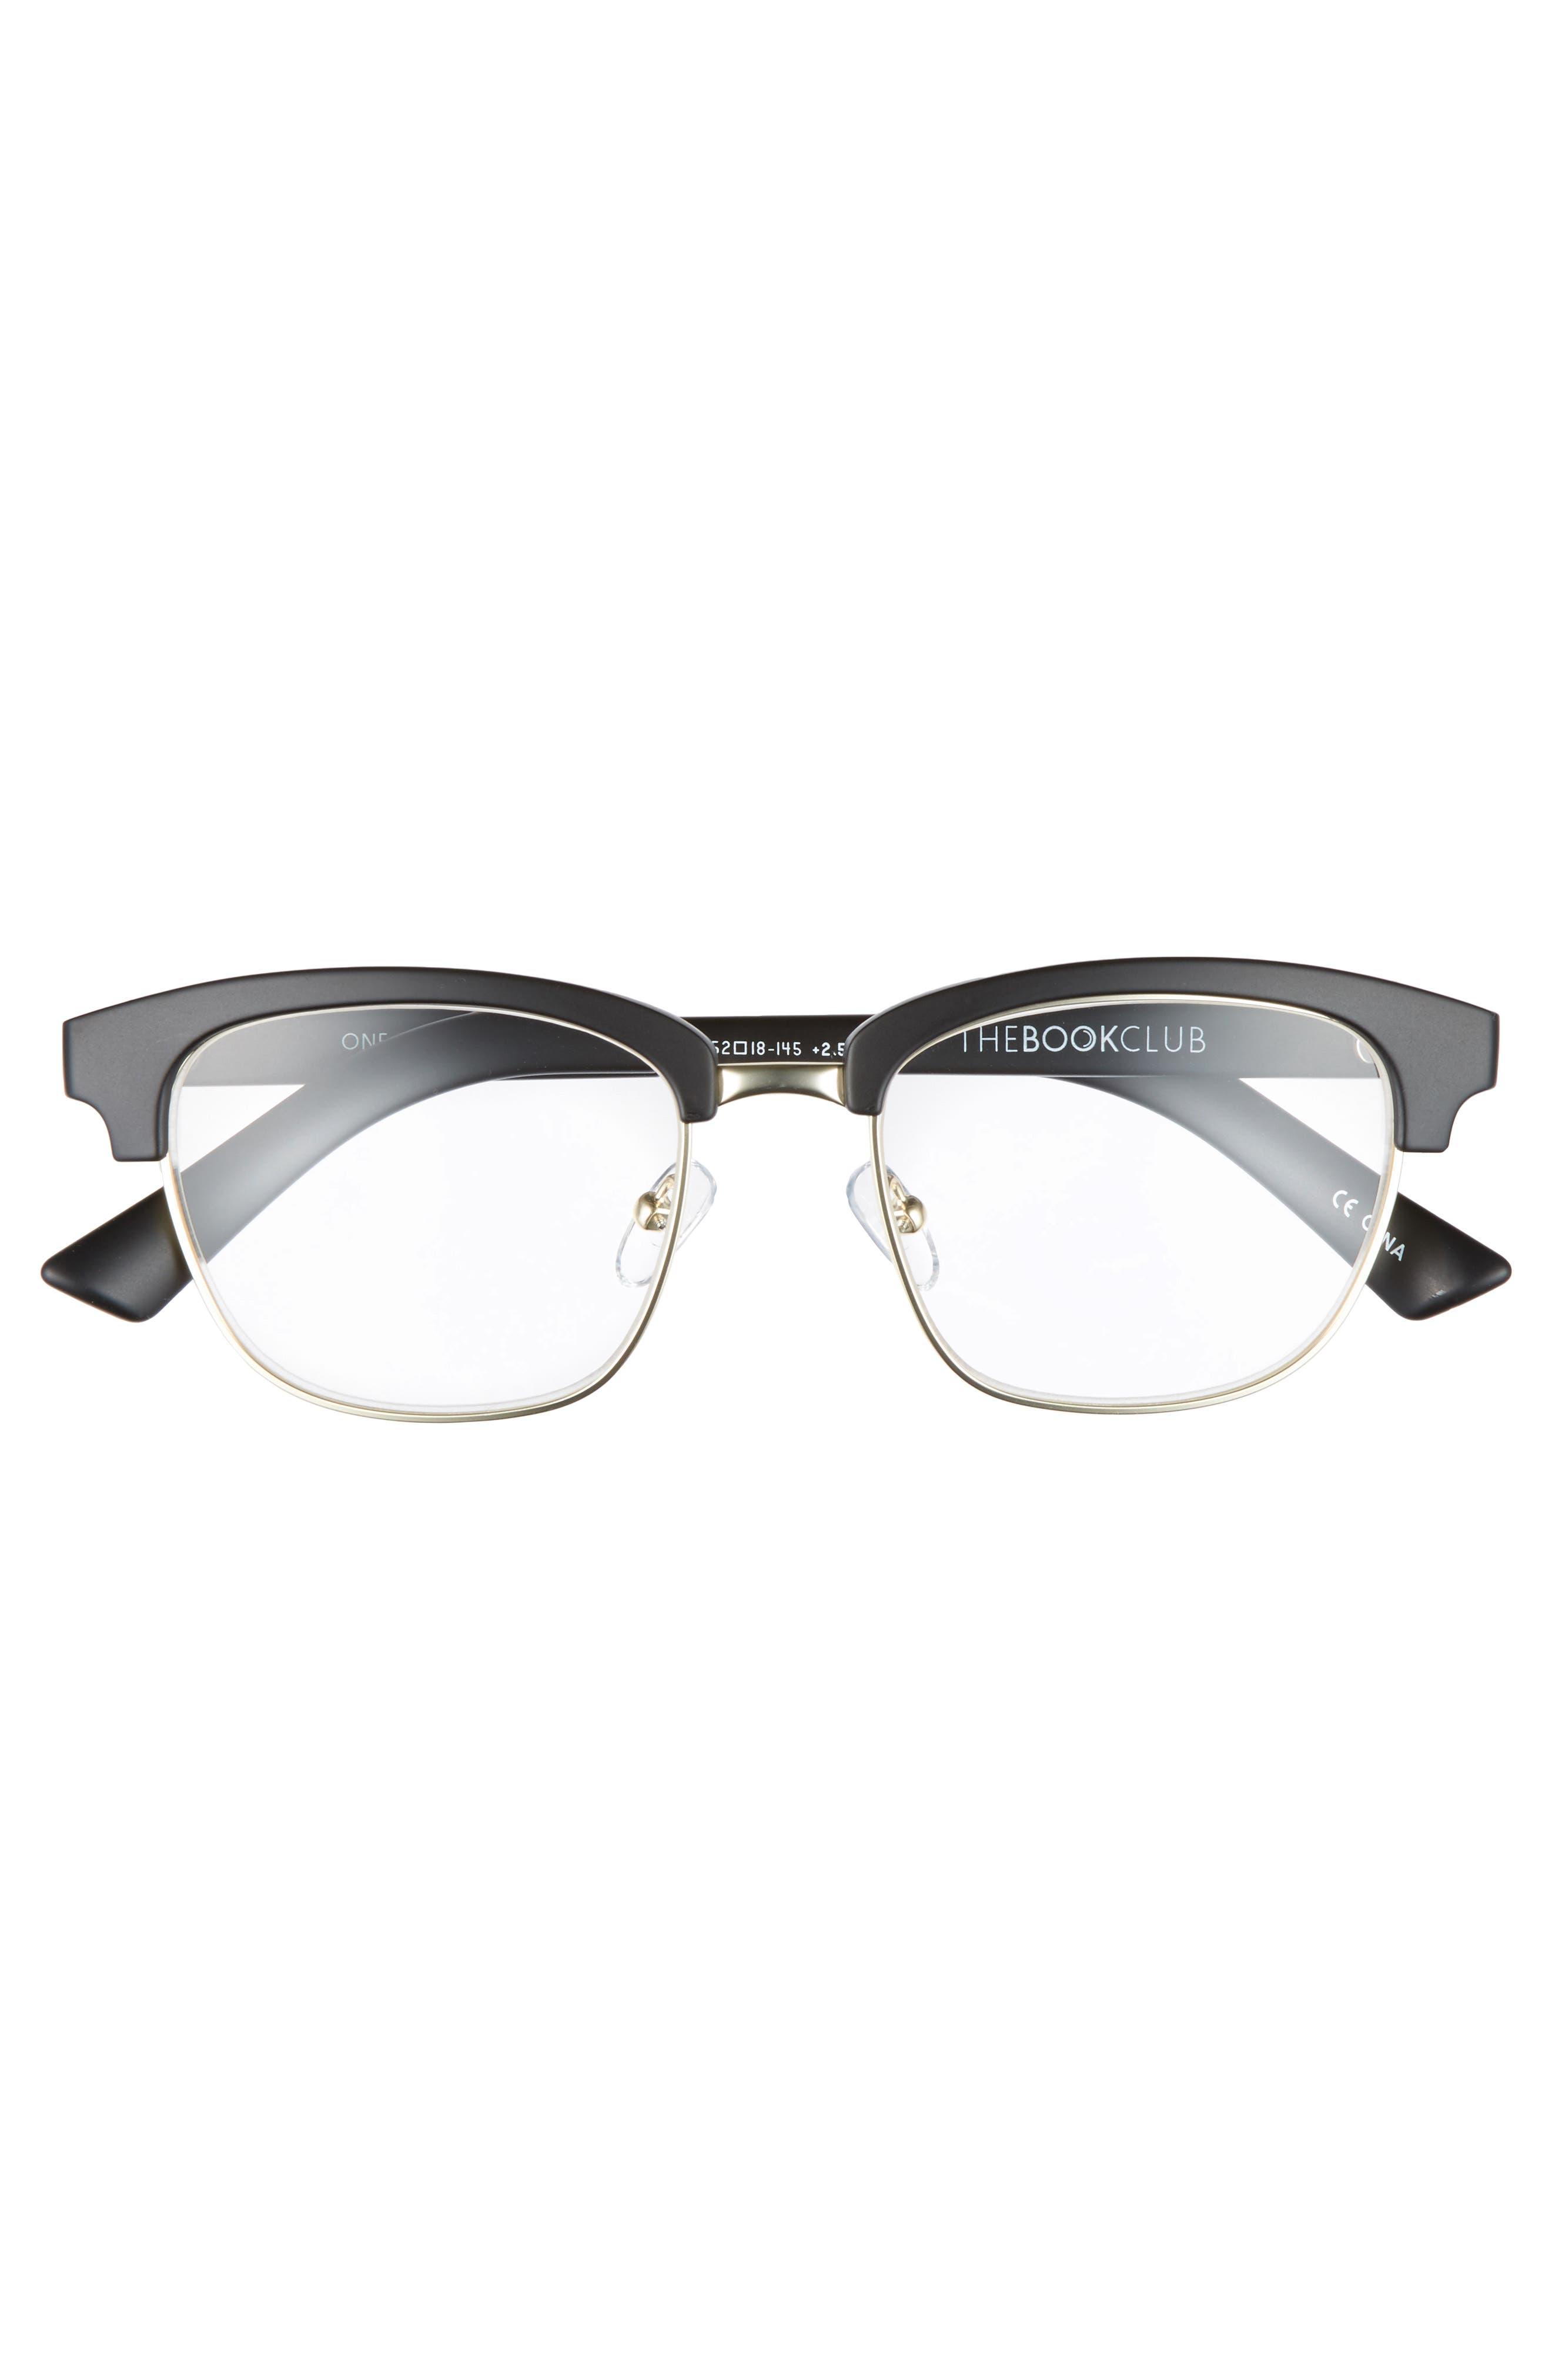 One Drew Over the English Test 52mm Reading Glasses,                             Alternate thumbnail 3, color,                             Black Marker